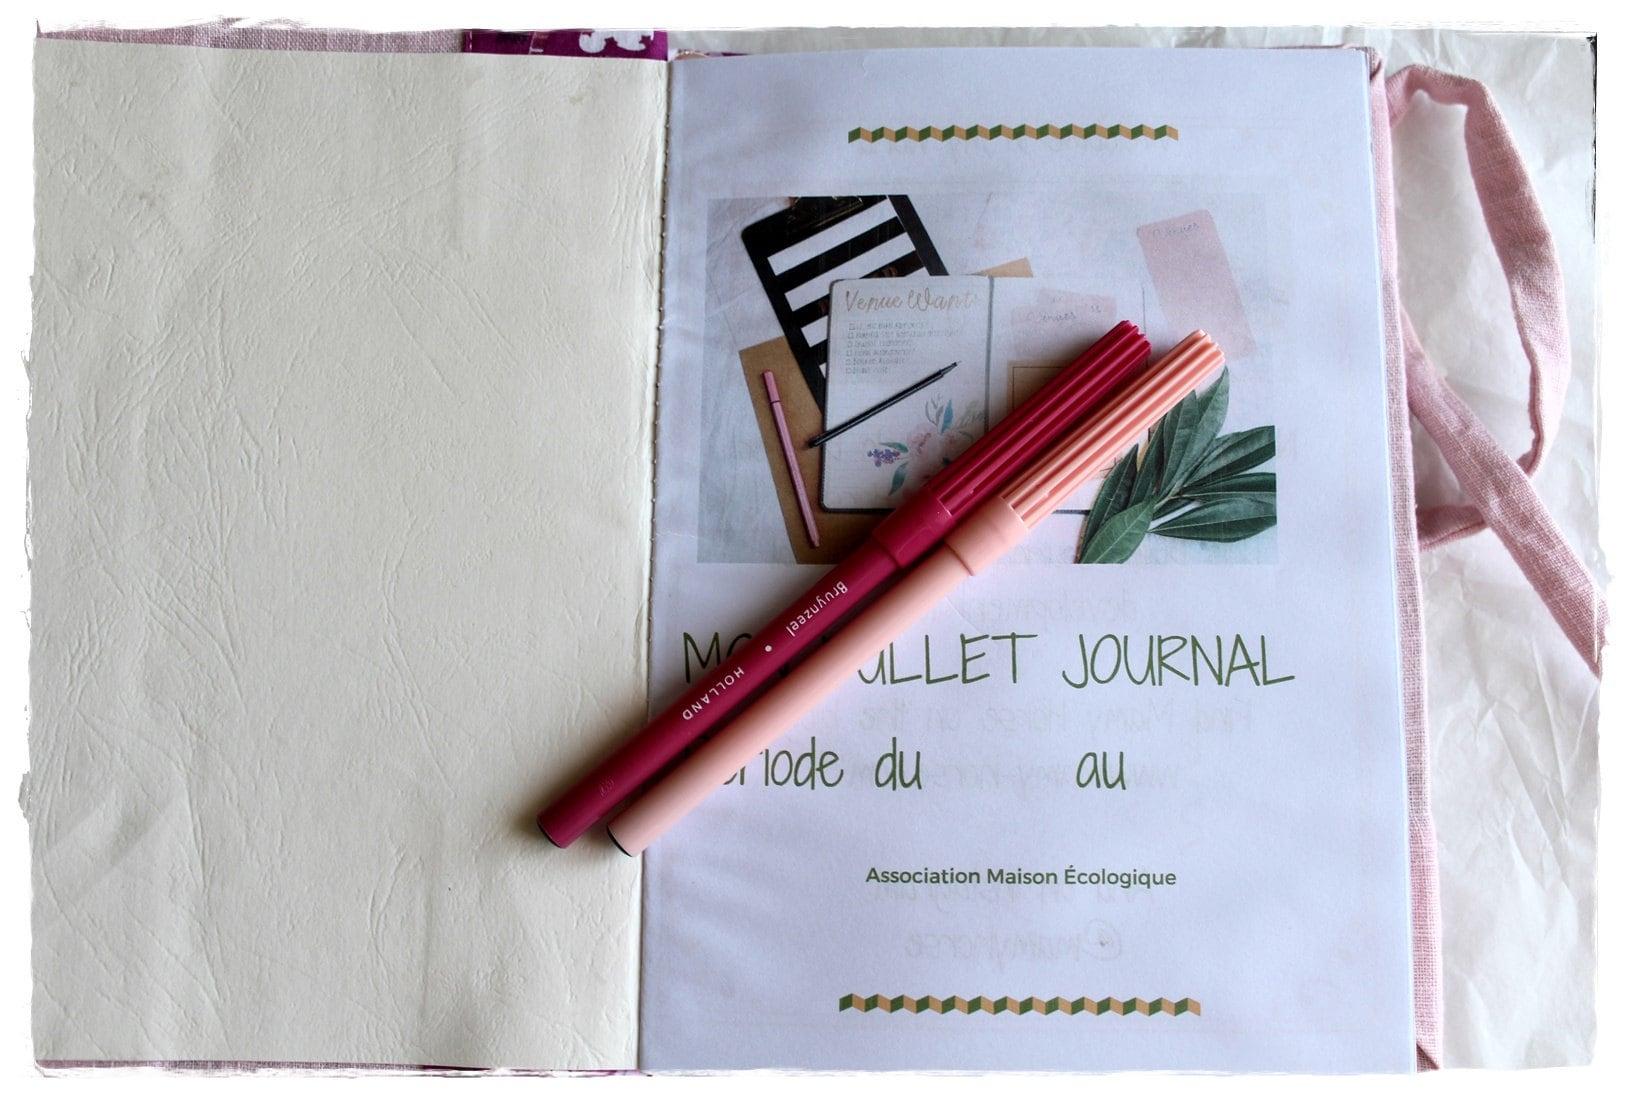 bullet journal artisanal, bujo, bujo addict, carnet créatif, planner